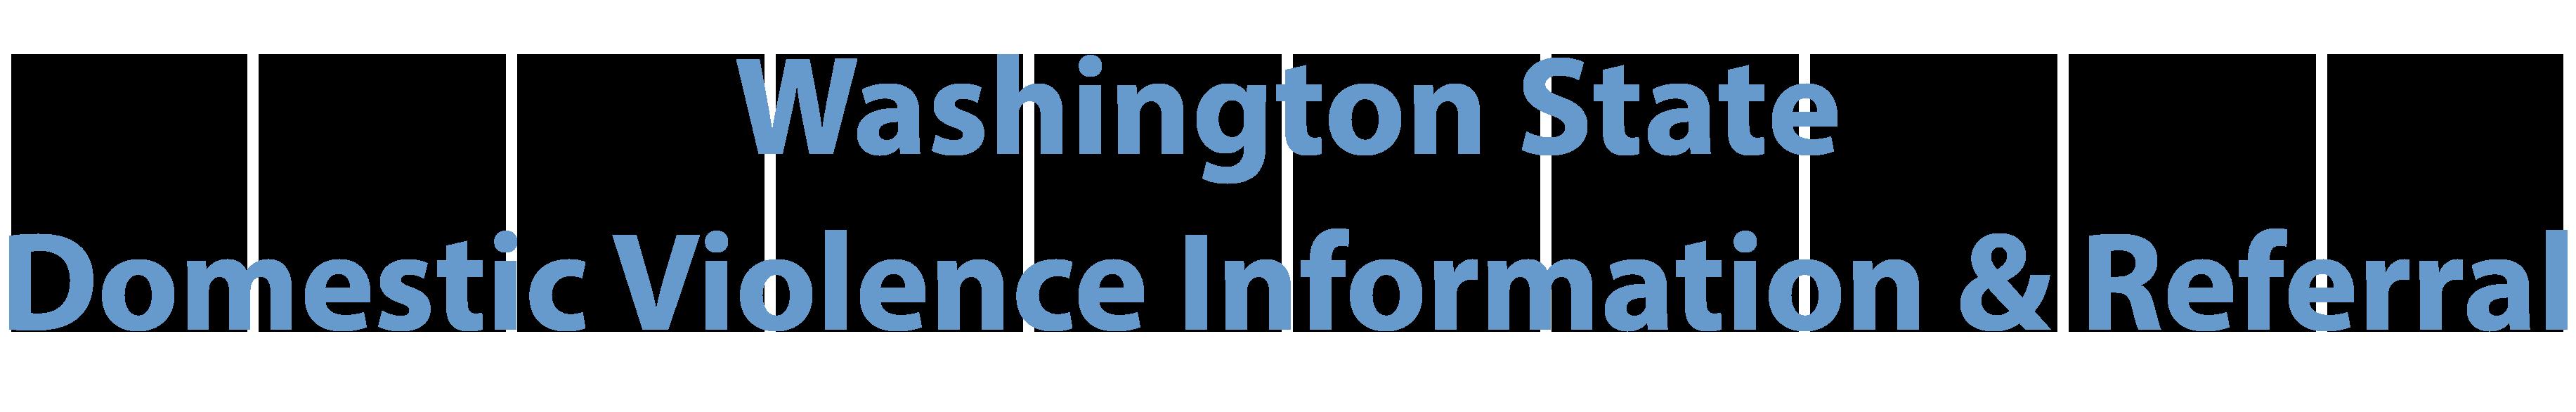 Washington Information and Referral